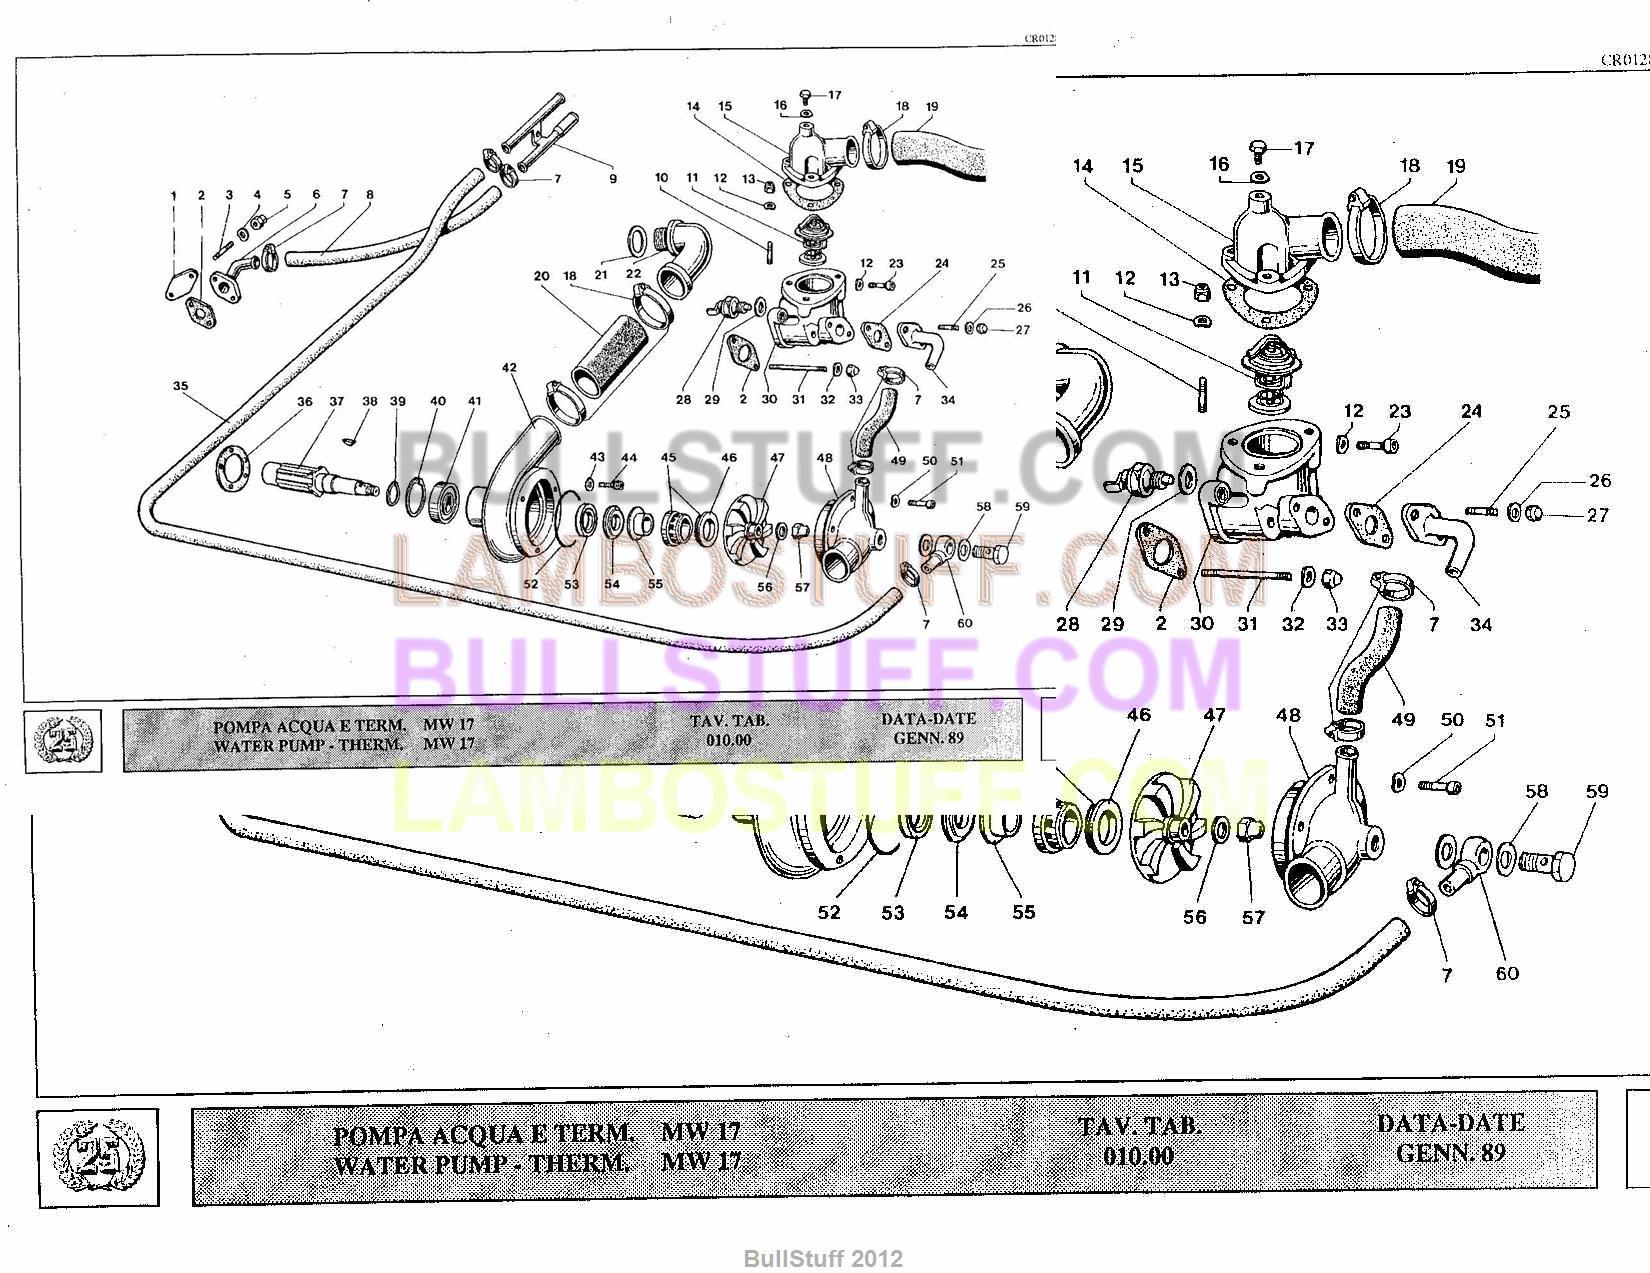 1989 lamborghini countach 25th usa water pump therm. Black Bedroom Furniture Sets. Home Design Ideas